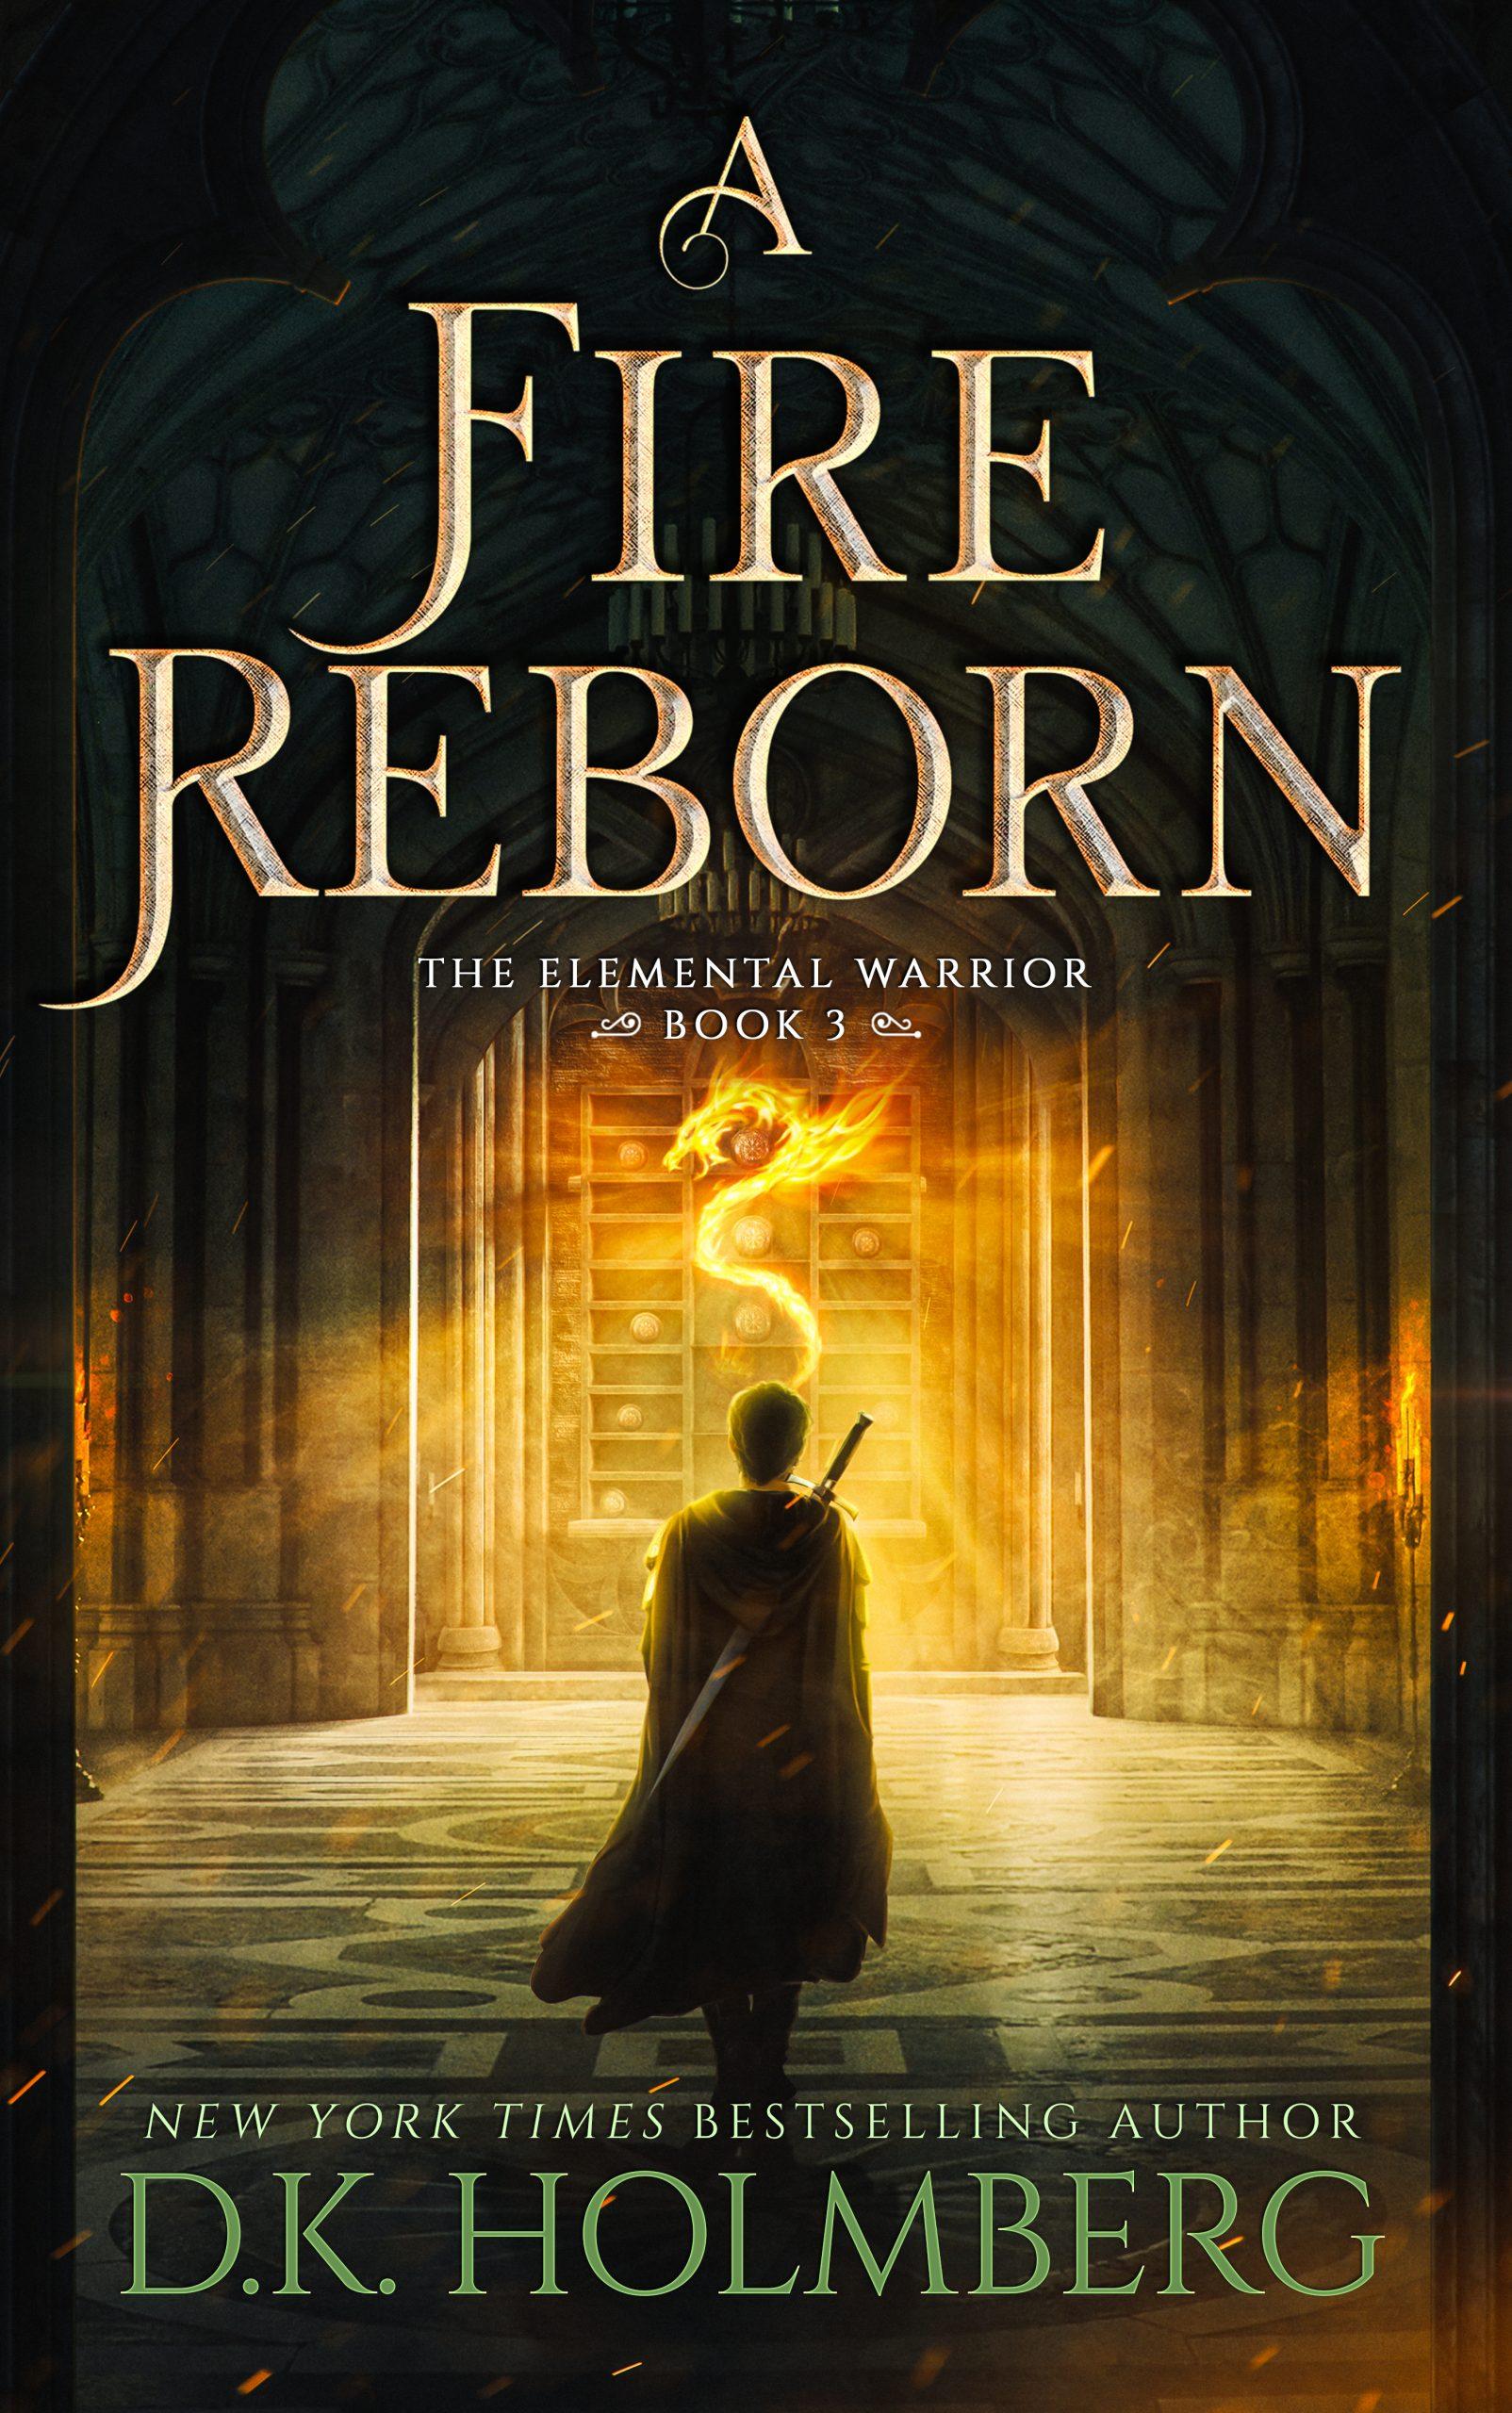 https://www.dkholmberg.com/wp-content/uploads/2020/10/EW-3-A-Fire-Reborn-eBook-scaled.jpg